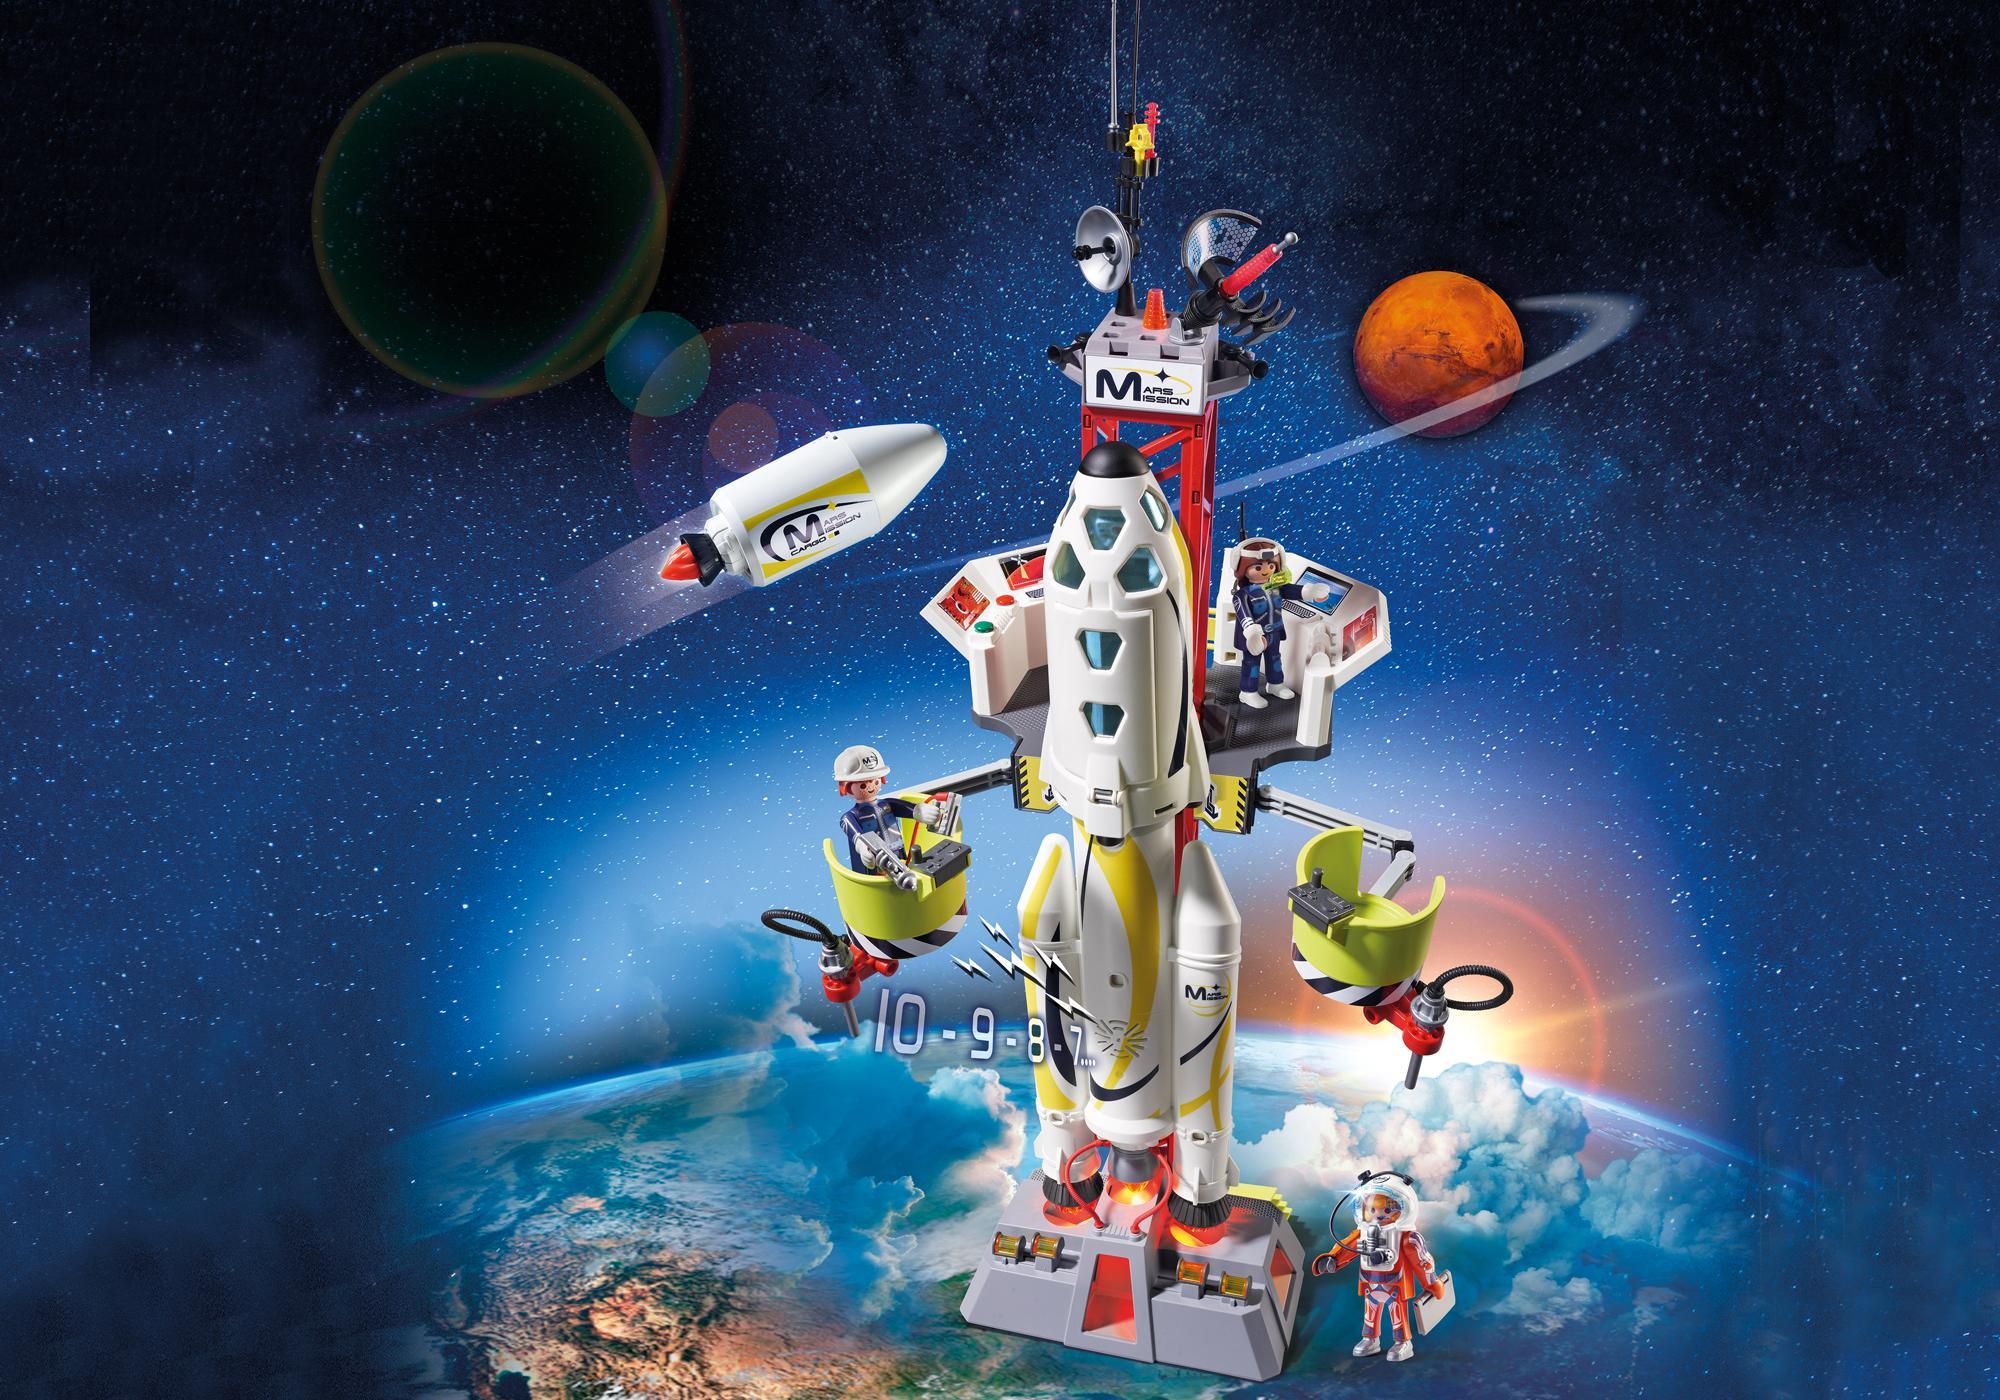 http://media.playmobil.com/i/playmobil/9488_product_detail/Mars-Rakete mit Startrampe